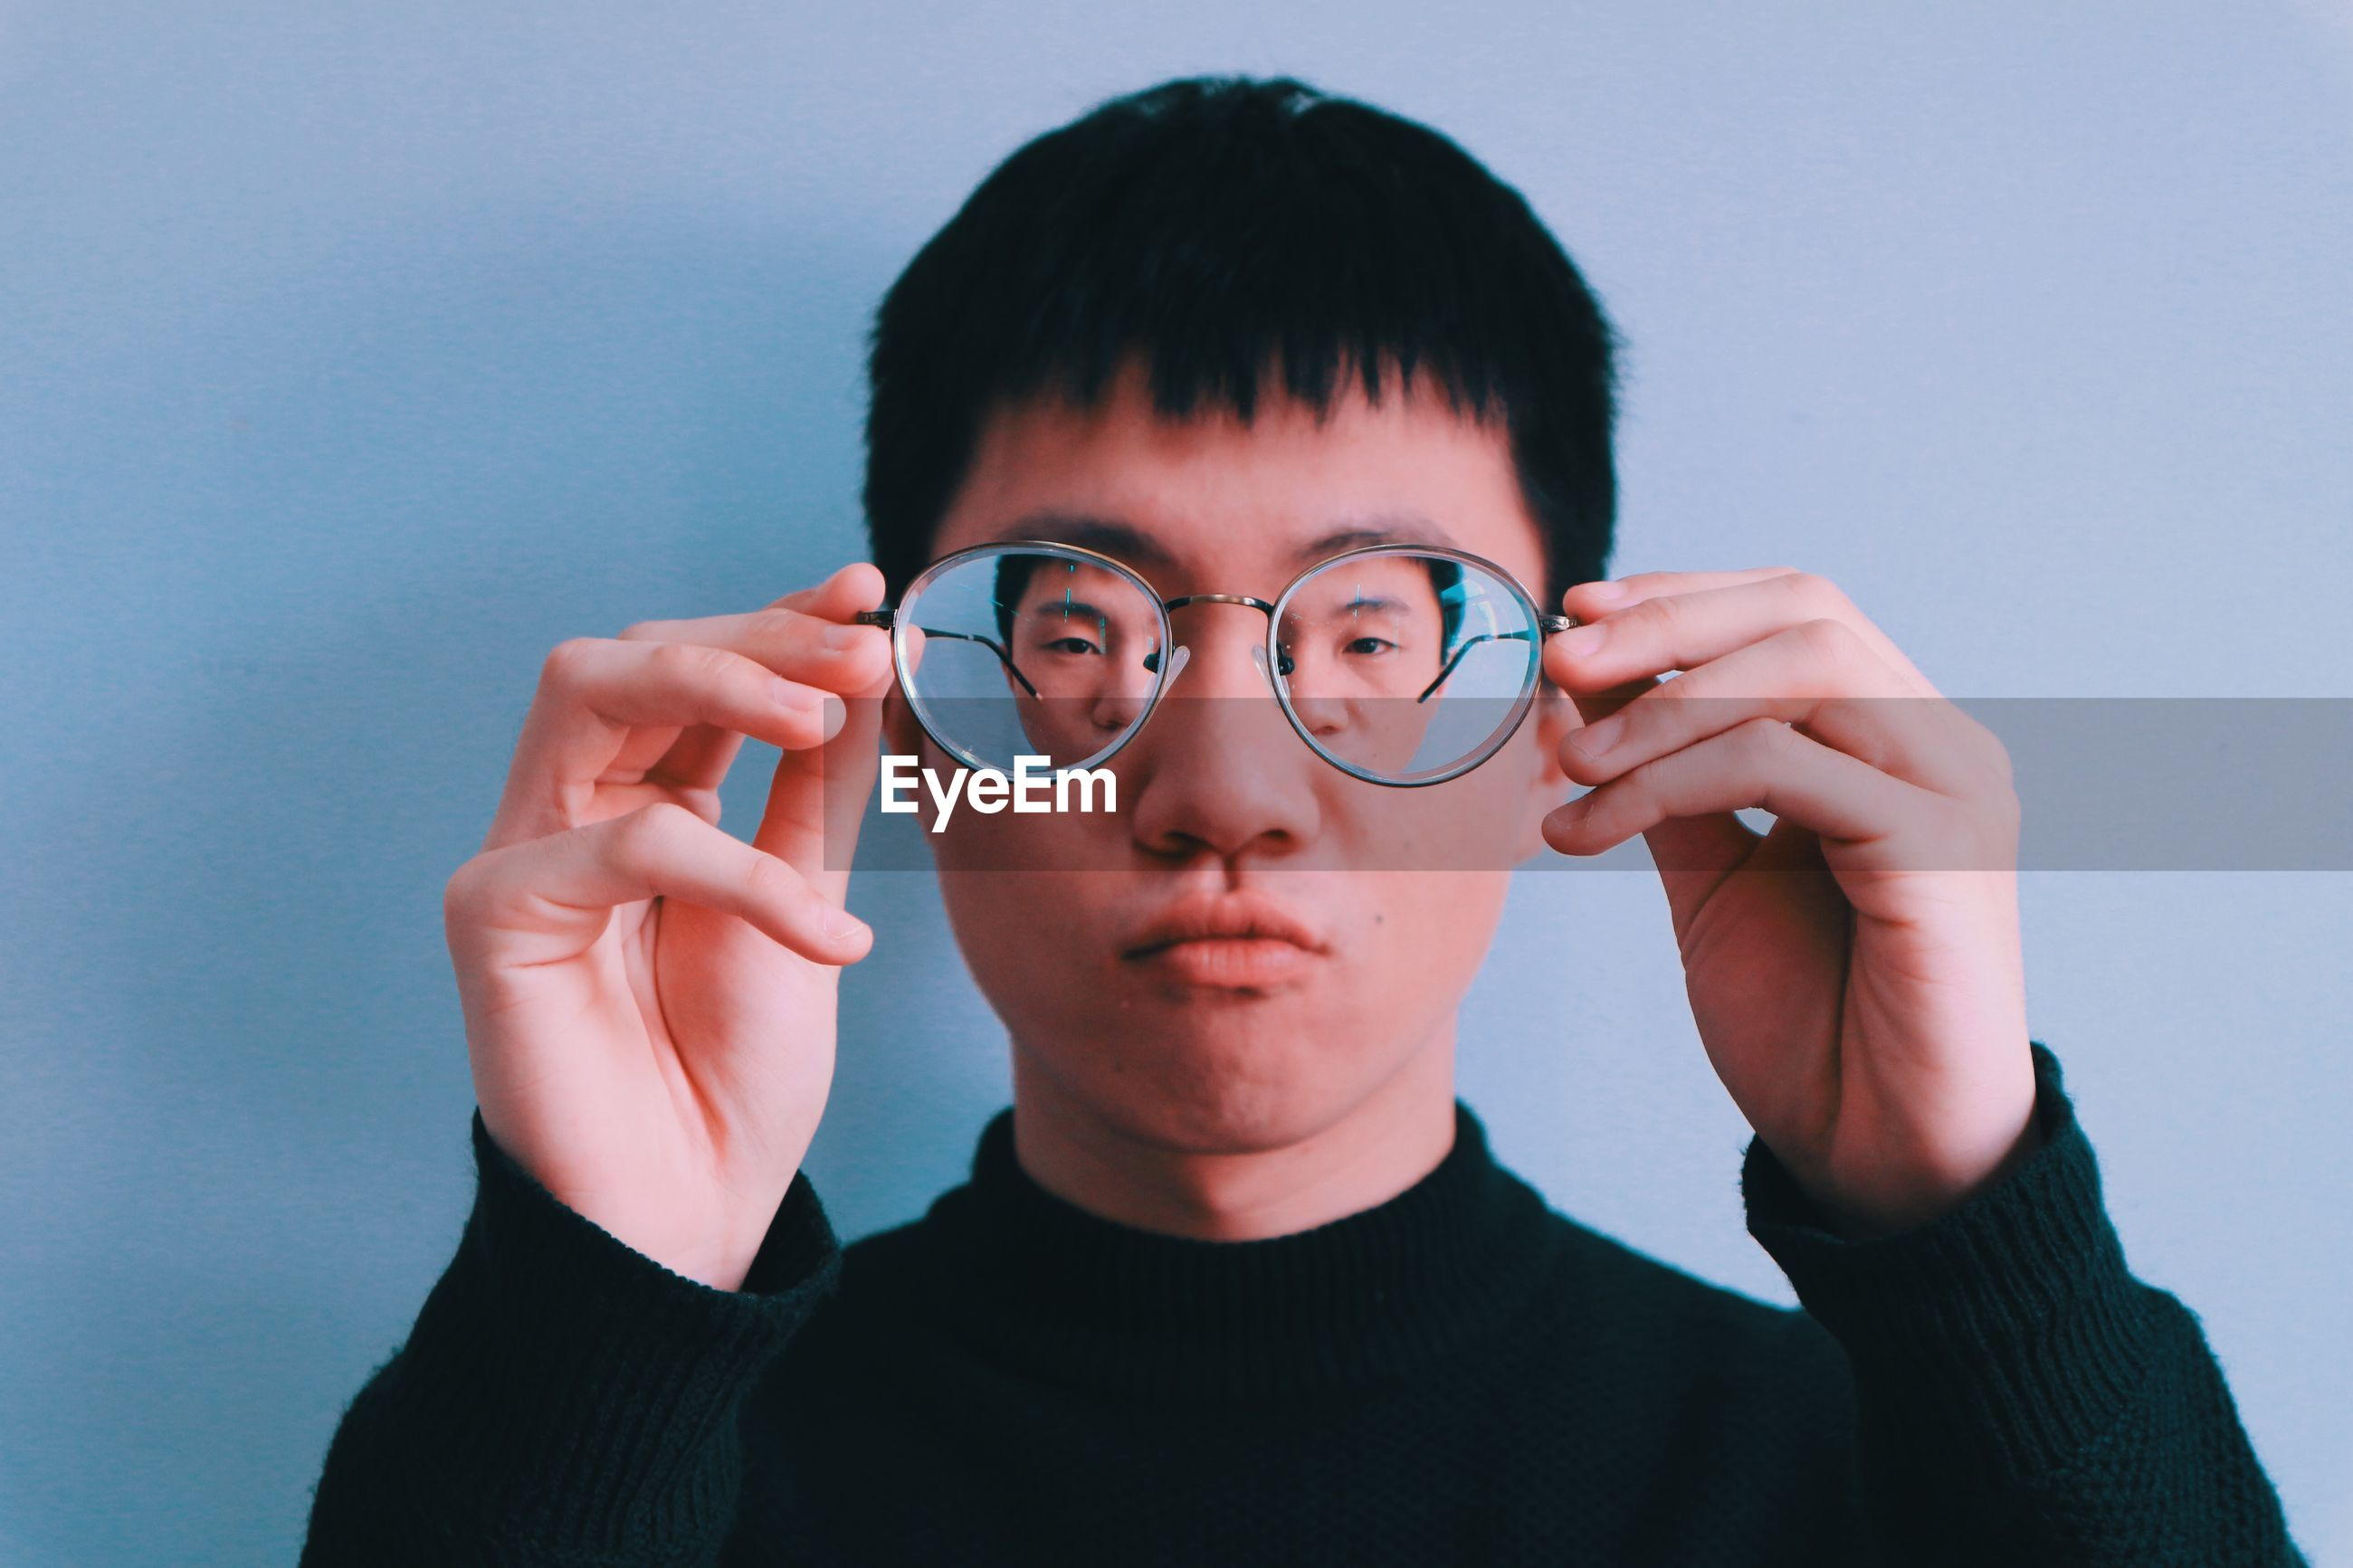 Portrait of man with eyeglasses